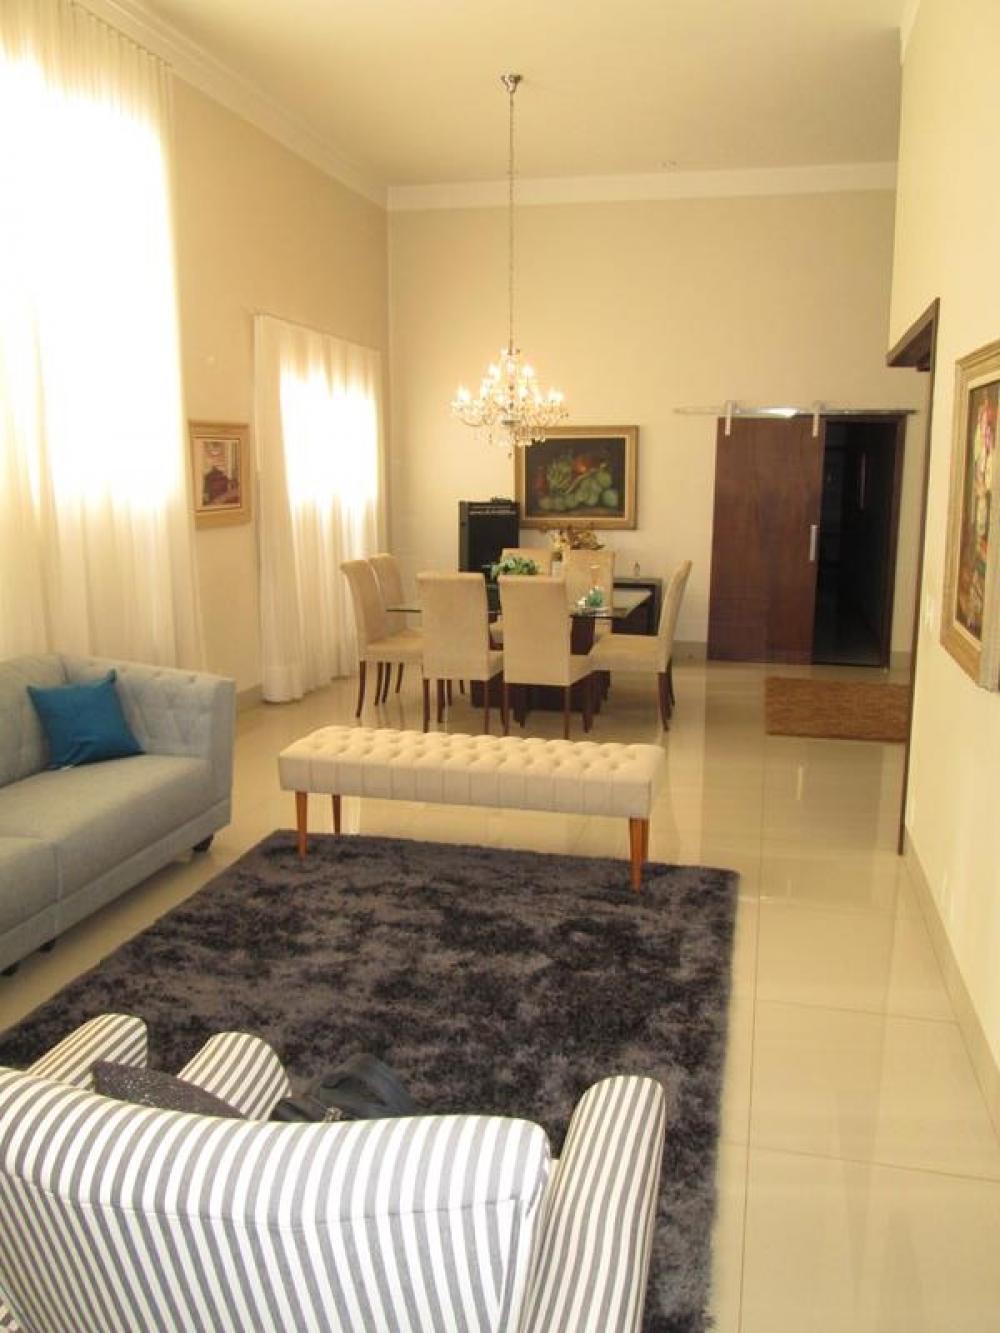 Mirassol Casa Venda R$1.100.000,00 4 Dormitorios 1 Suite Area do terreno 523.97m2 Area construida 333.00m2